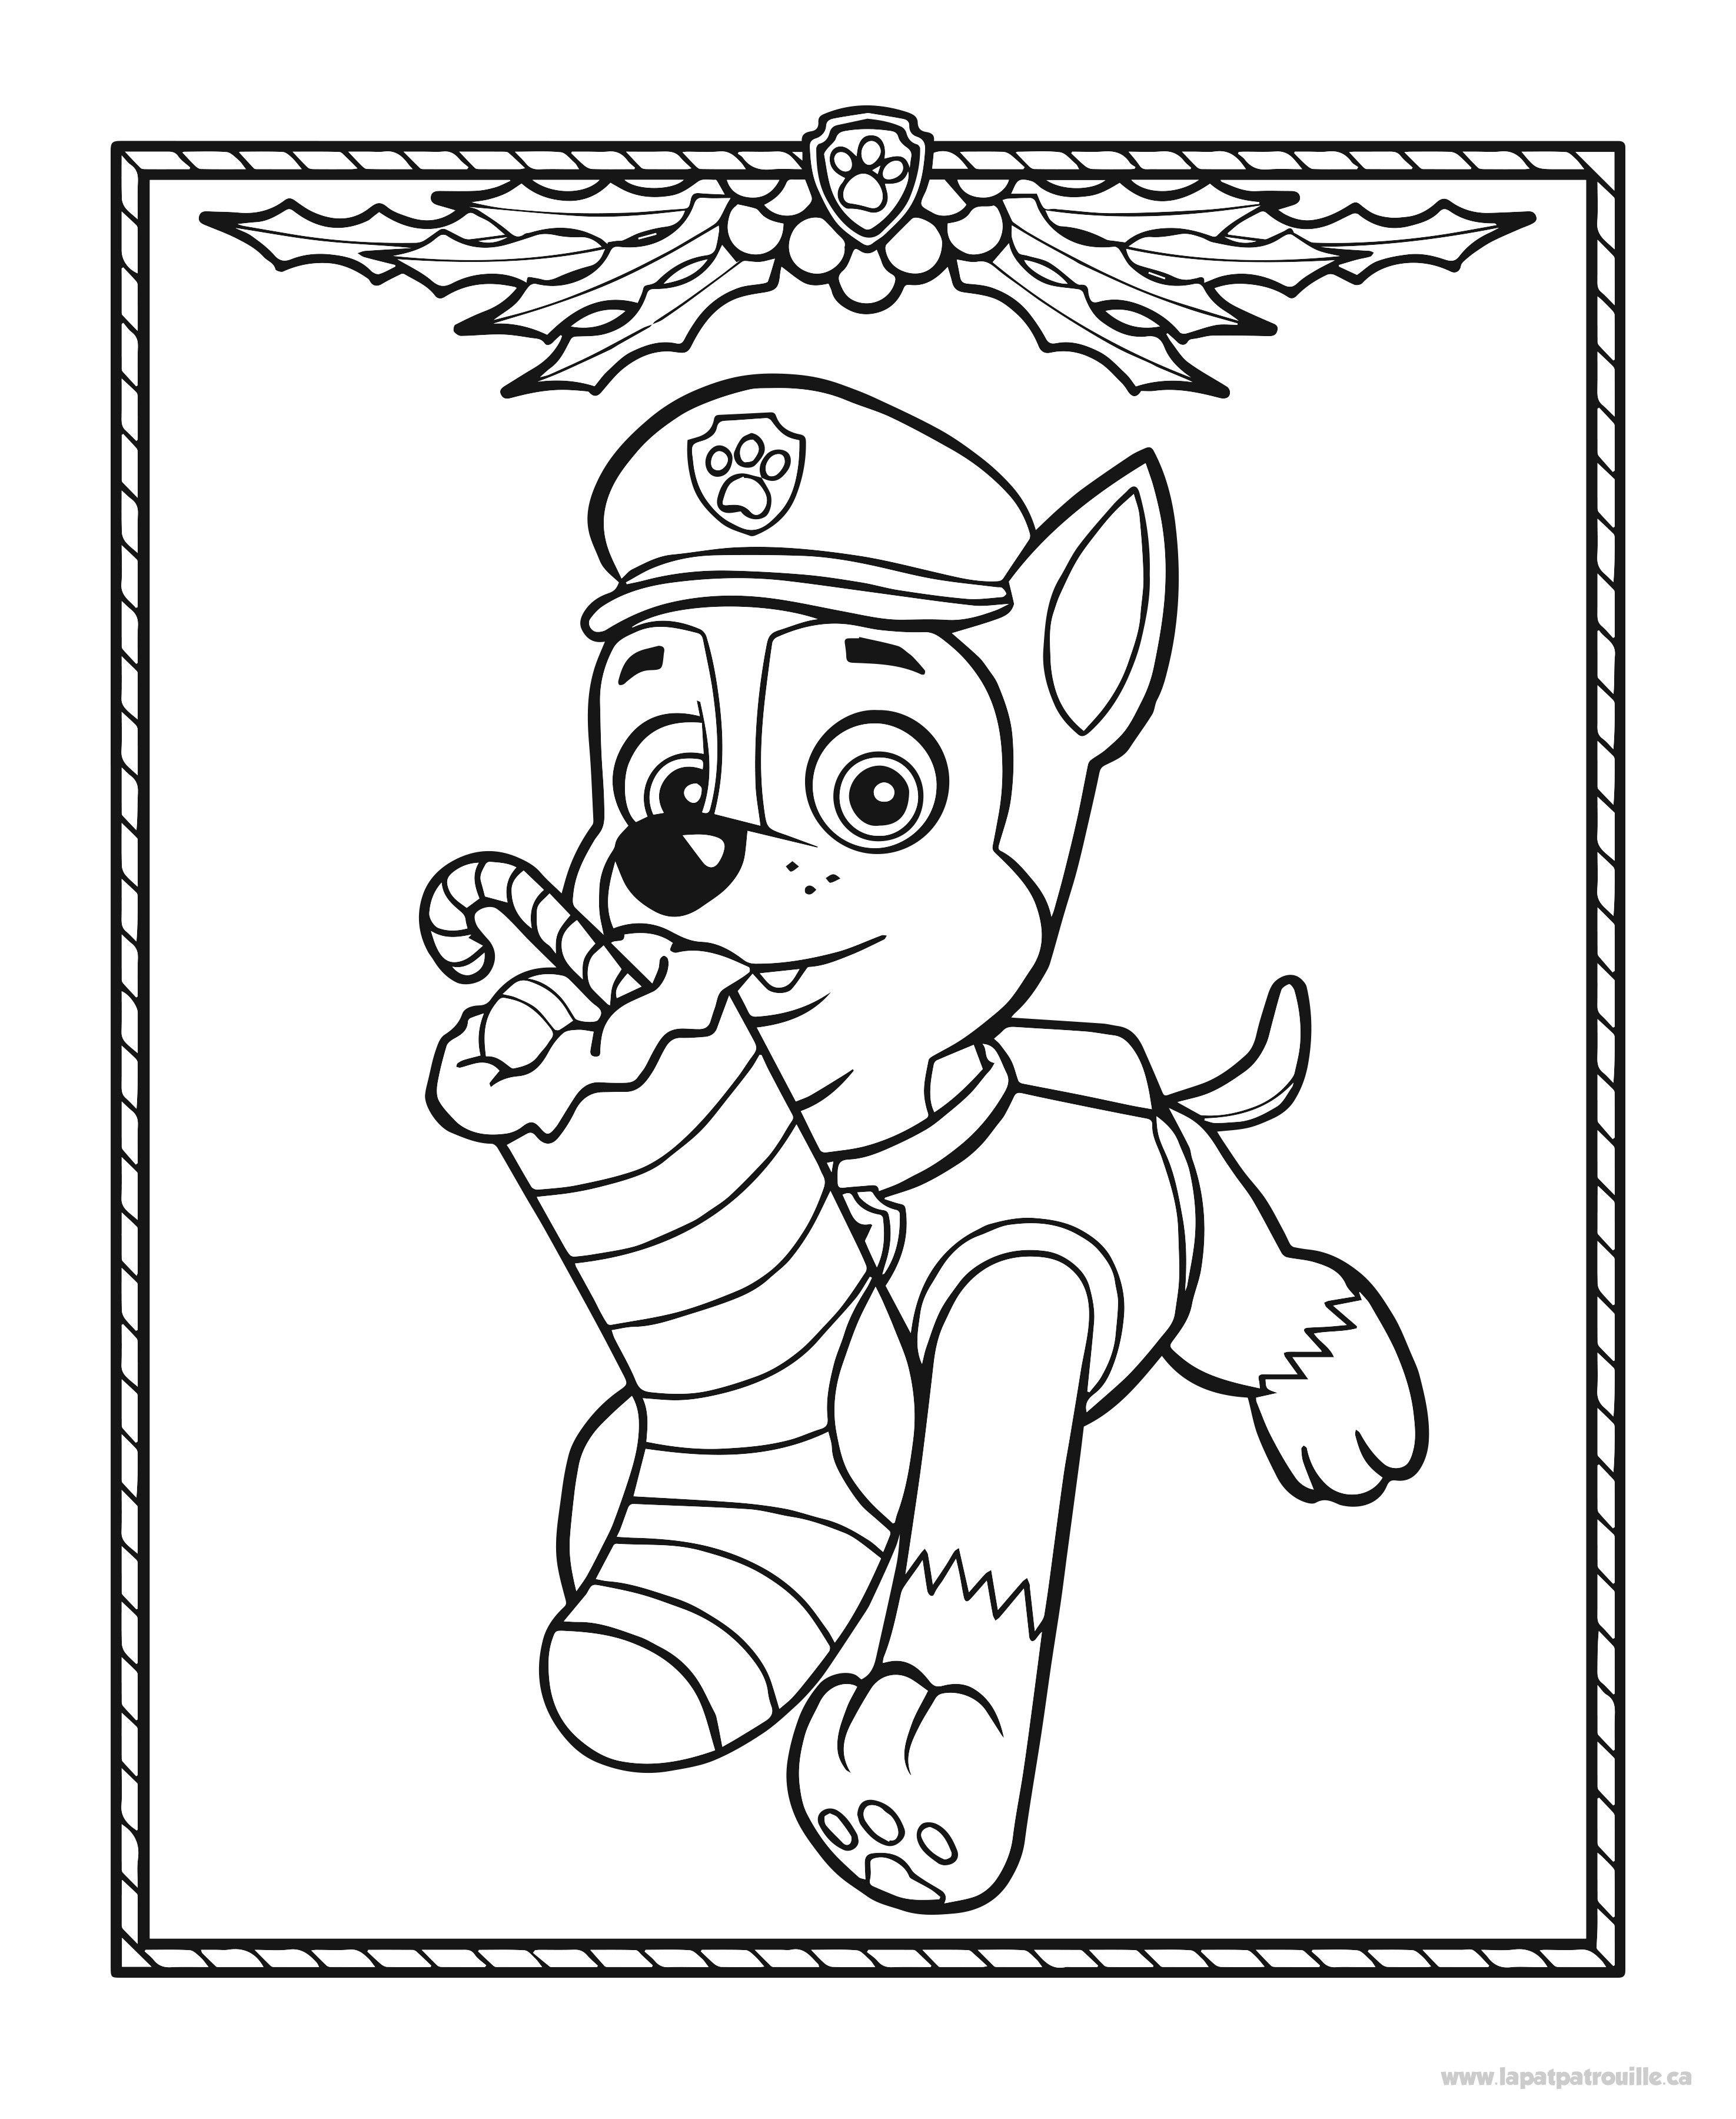 Coloriage La Pat Patrouille Colorear Patrulla Canina Dibujos